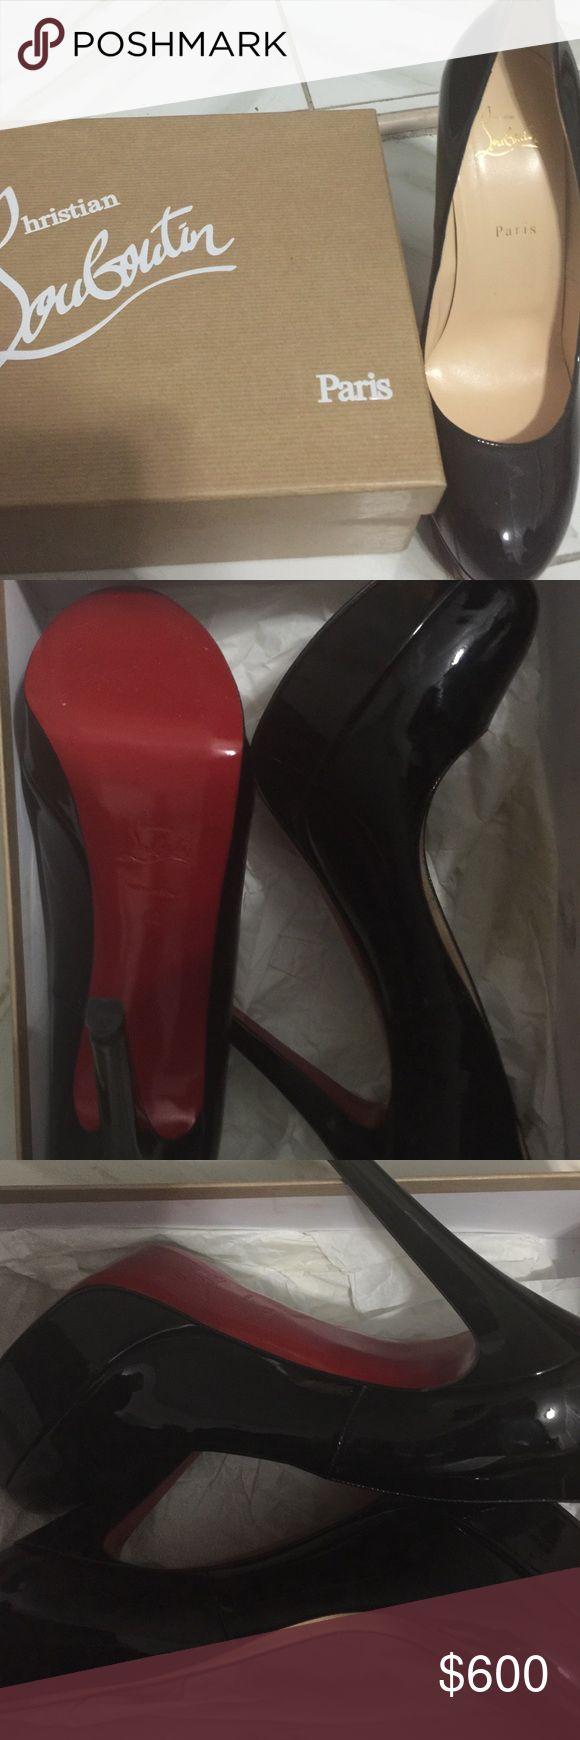 Classic black Christian louboutins Classic sleek black Louboutins, only worn once, size 42(12) Christian Louboutin Shoes Platforms